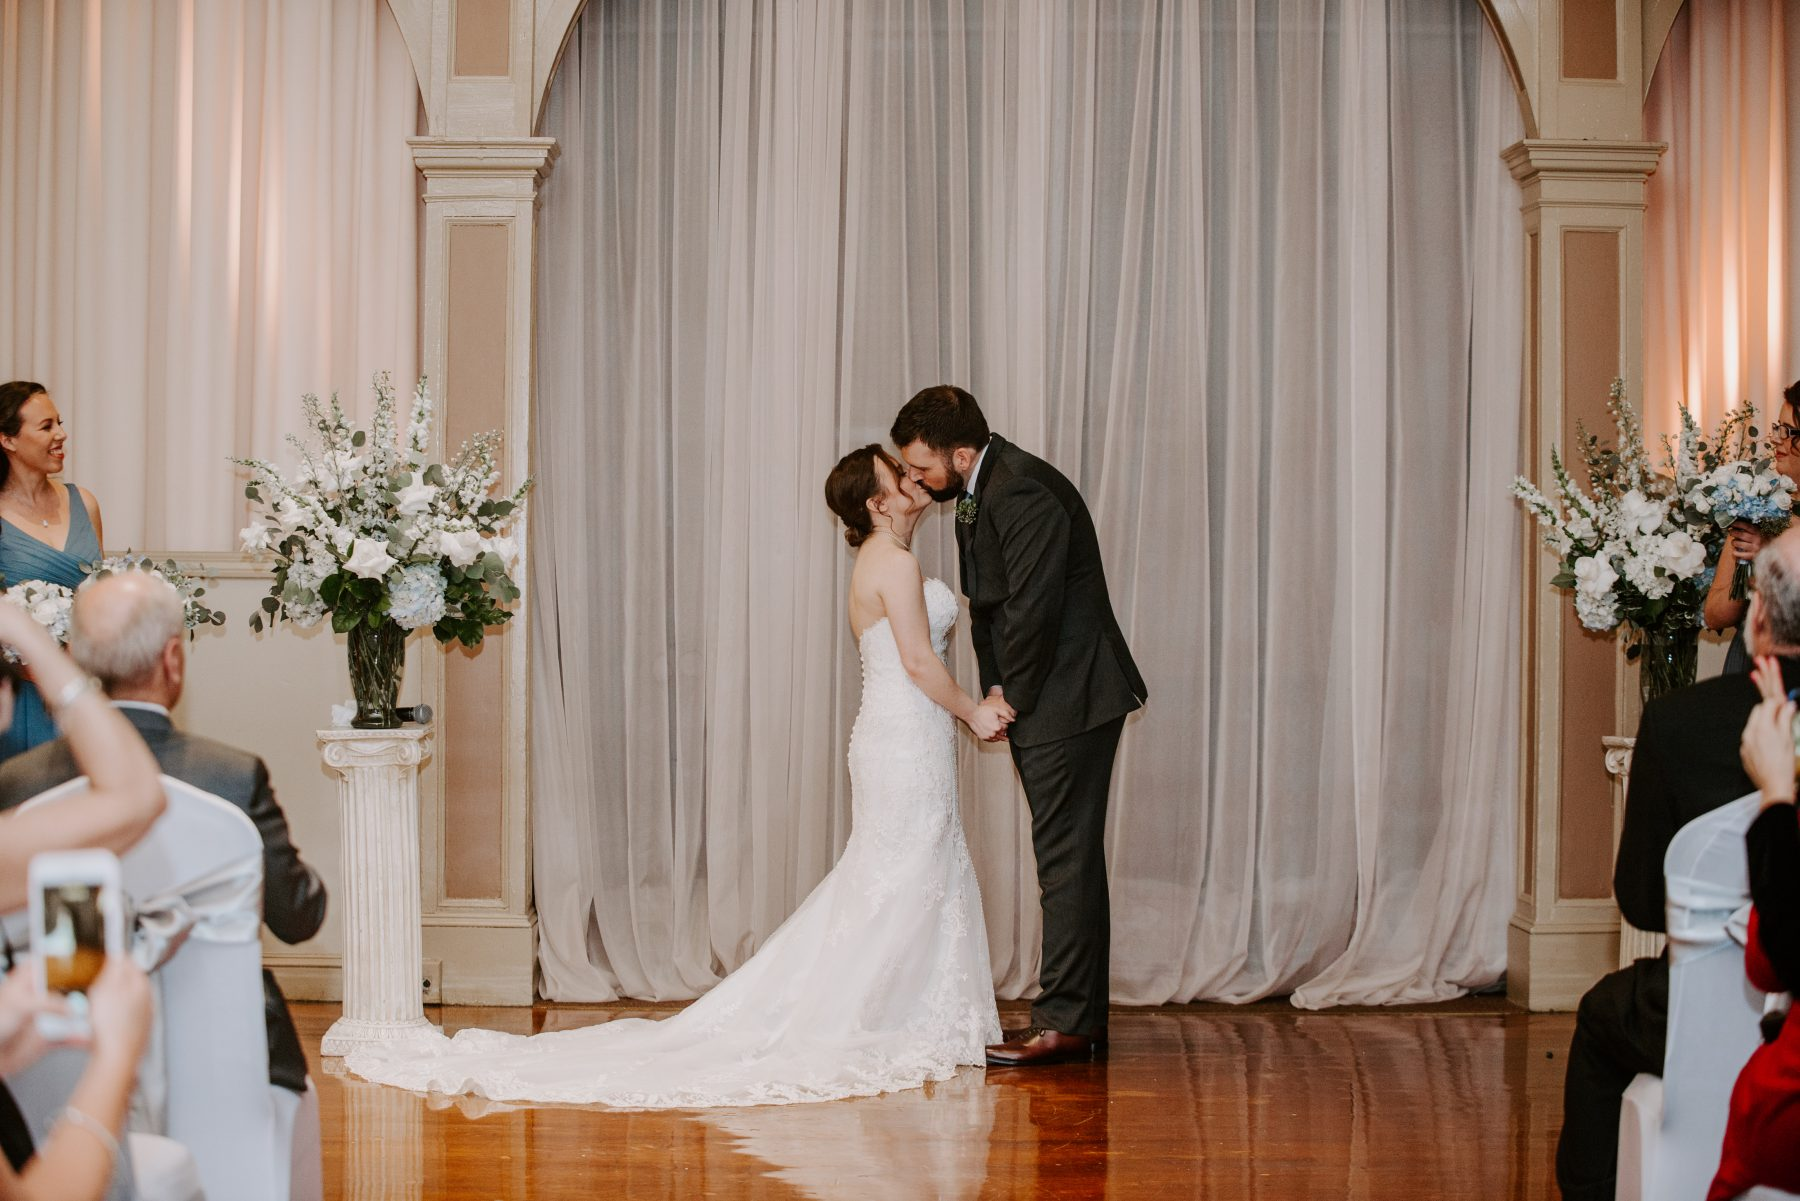 Rhodes on the Pawtuxet Cranston Wedding Ashley and David Blueflash Photography 15